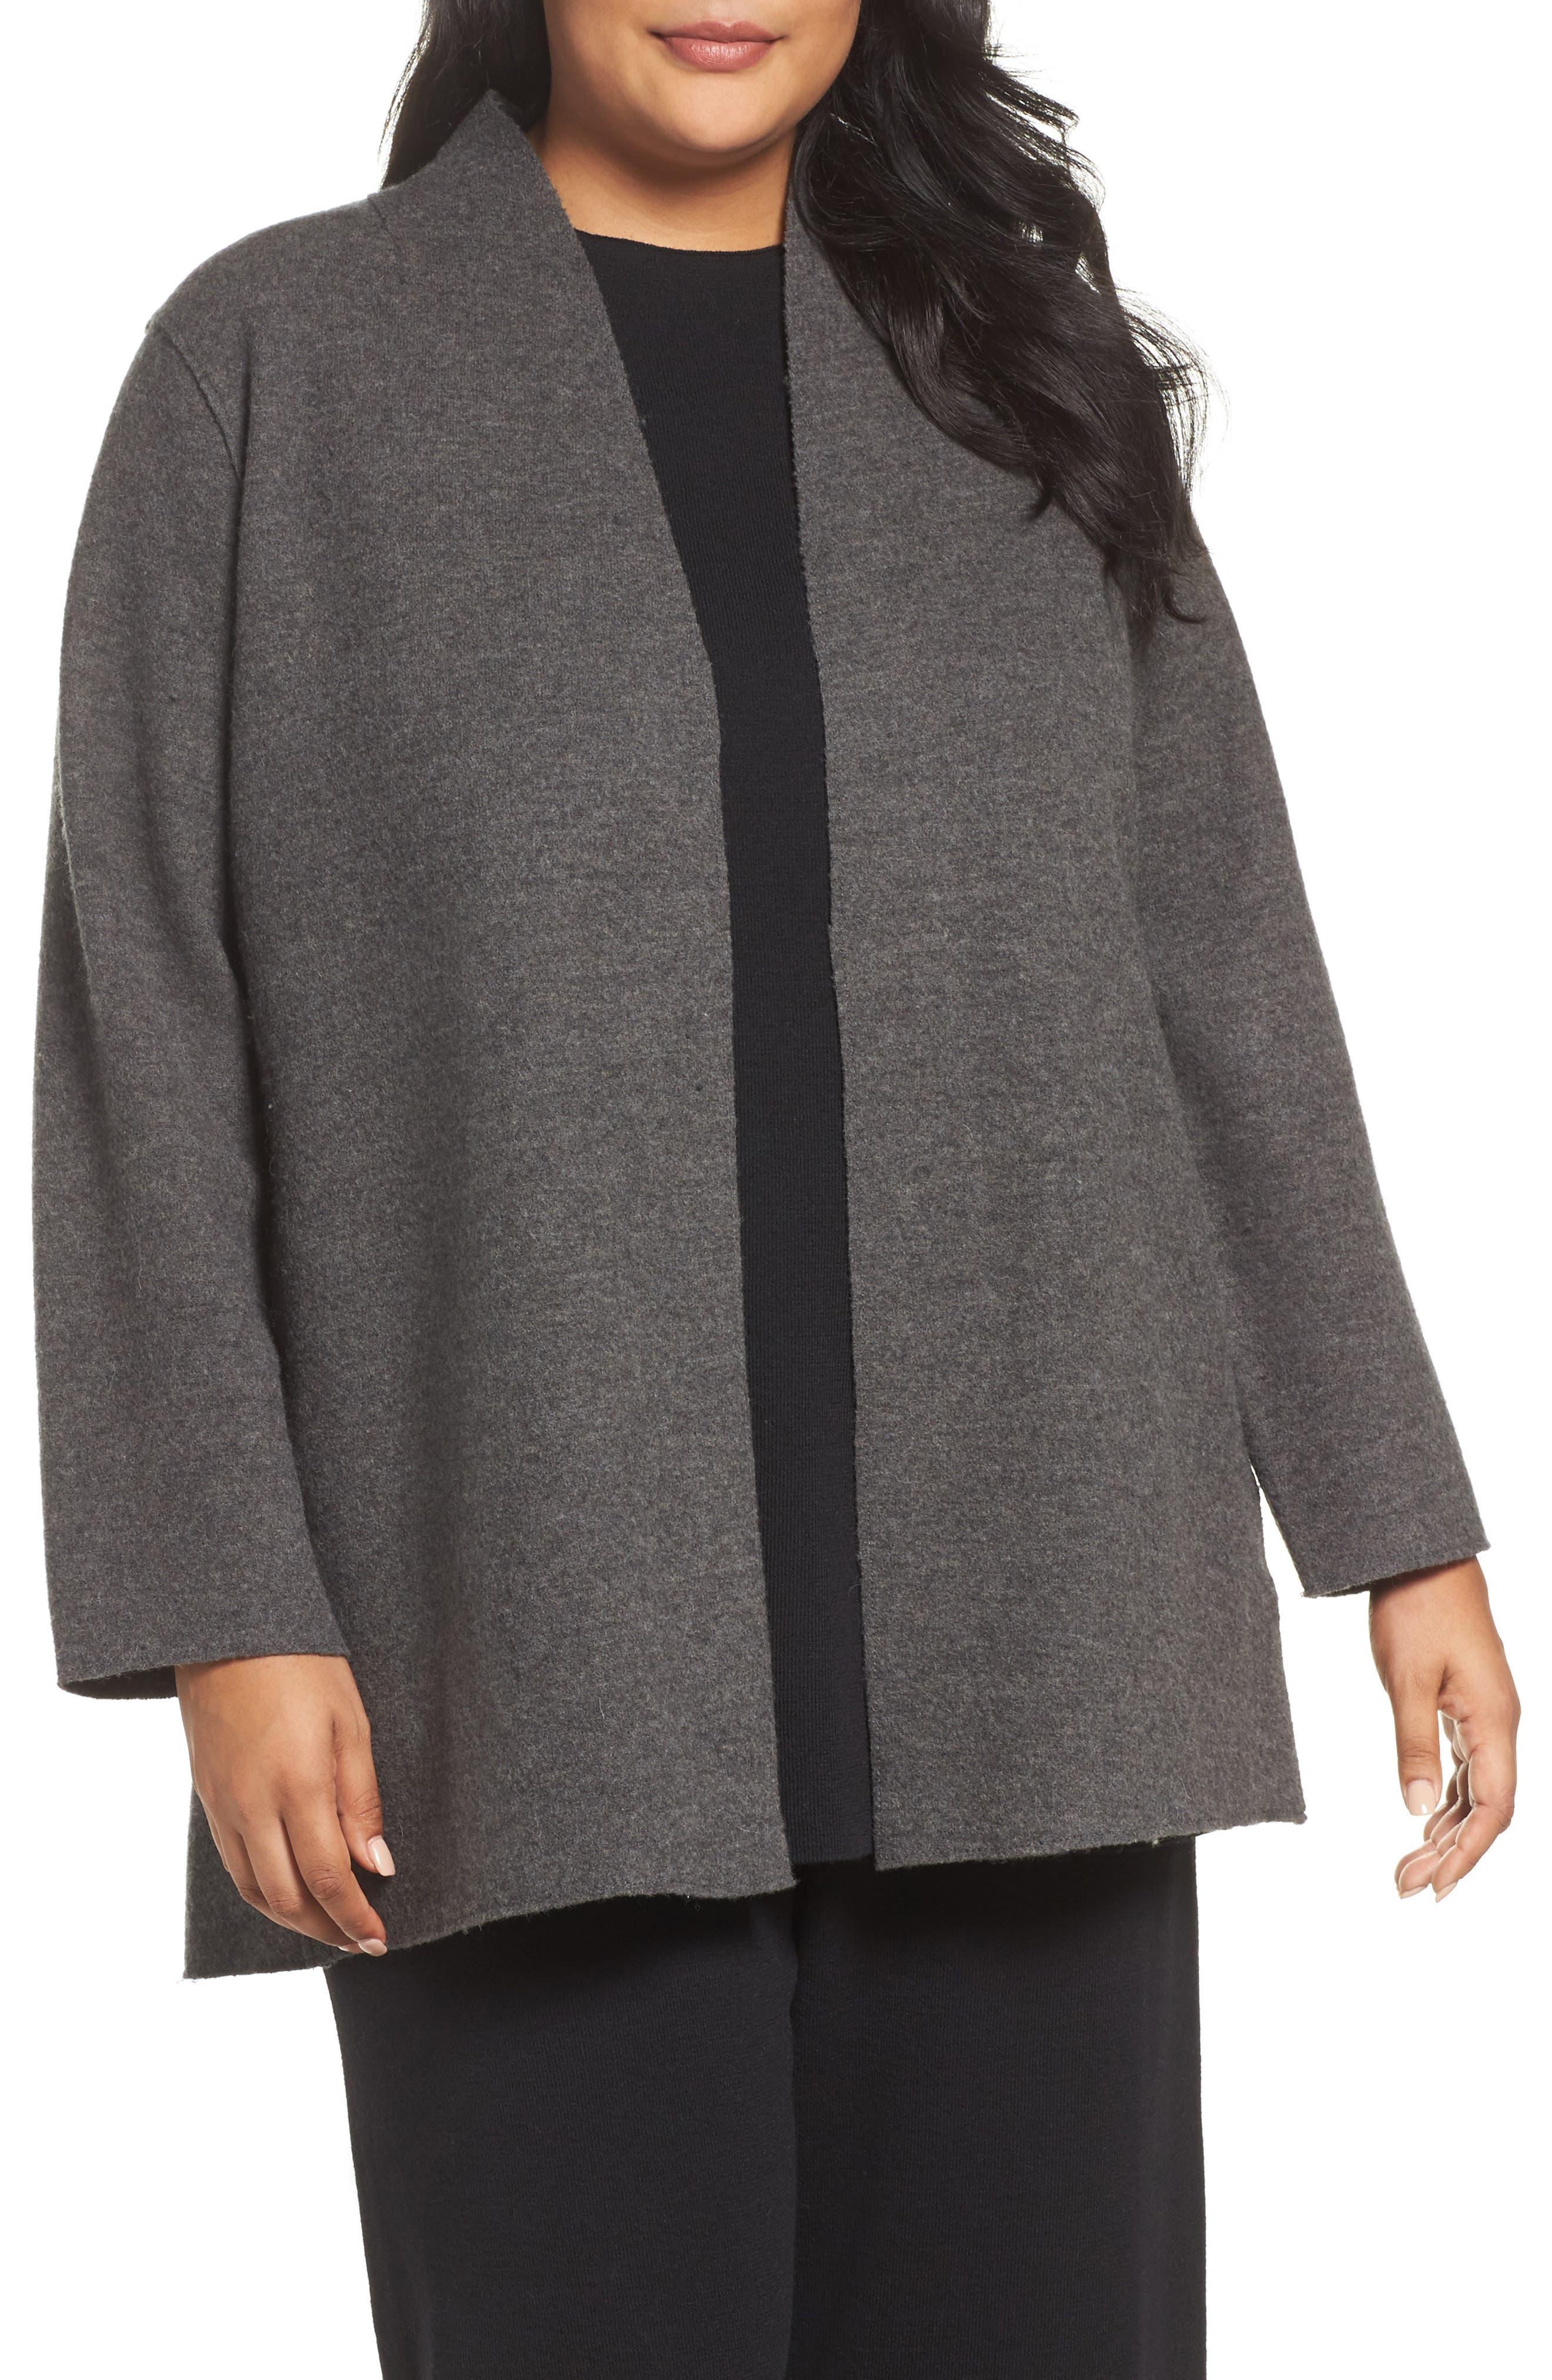 Eileen Fisher Boiled Wool Jacket (Plus Size)